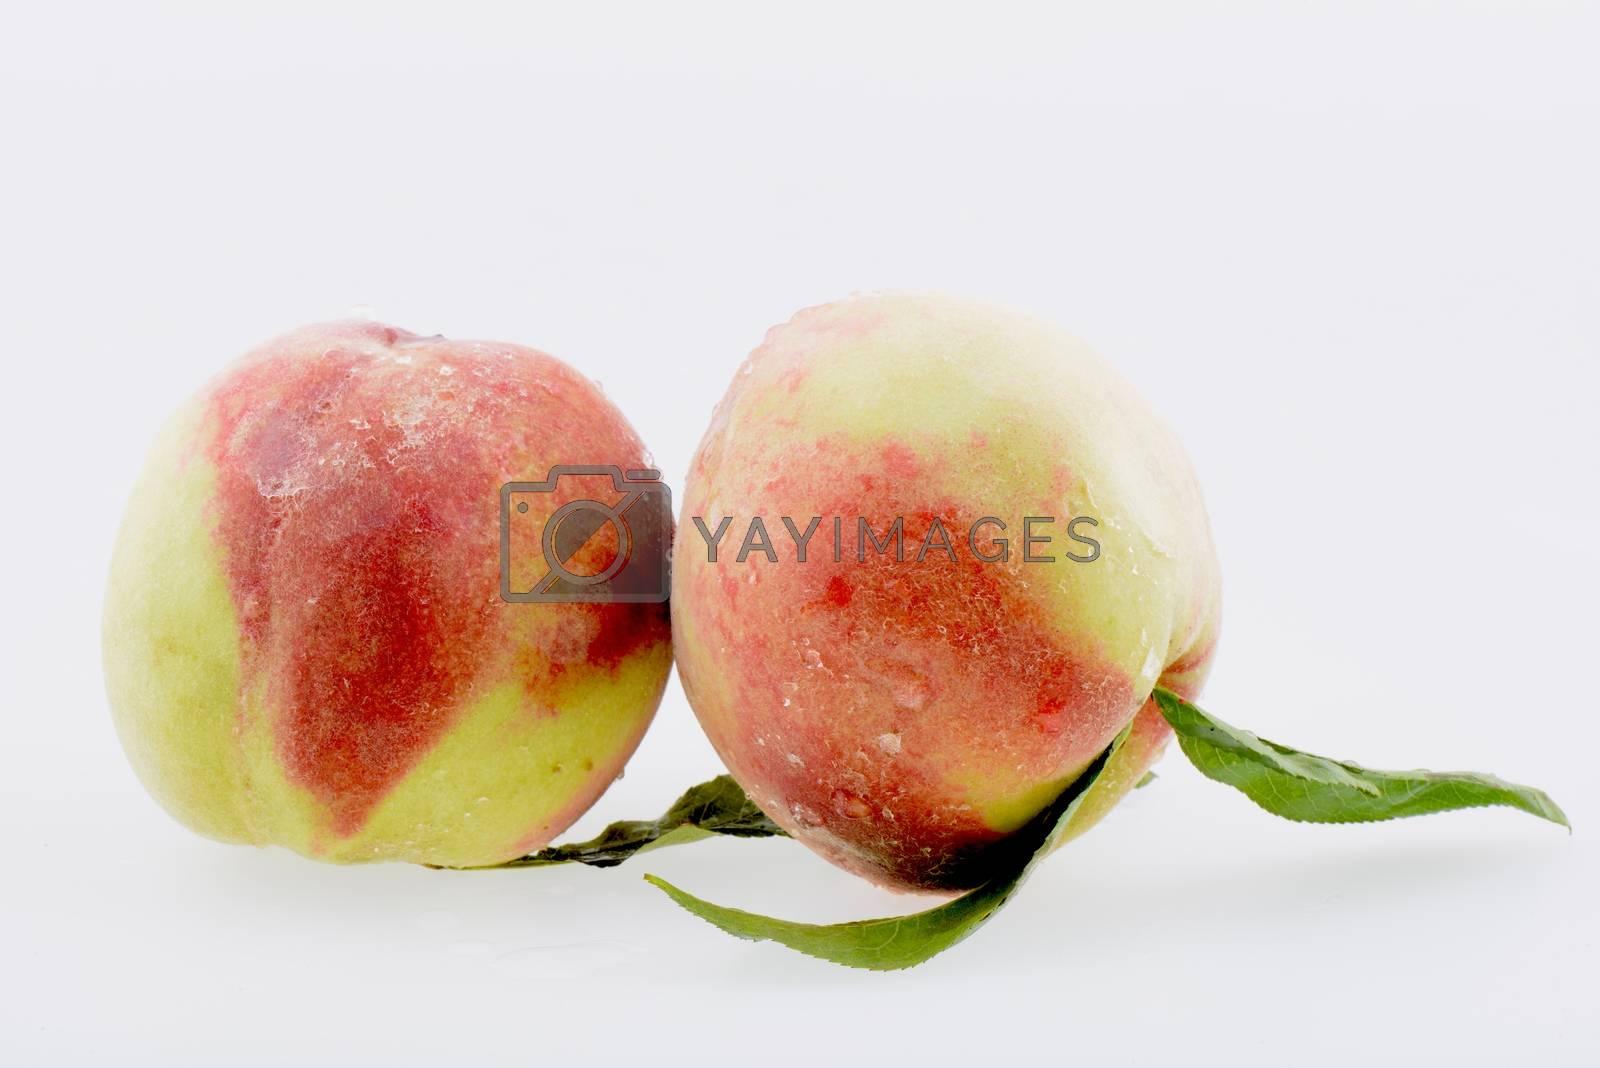 Fresh peach fruits on a white background